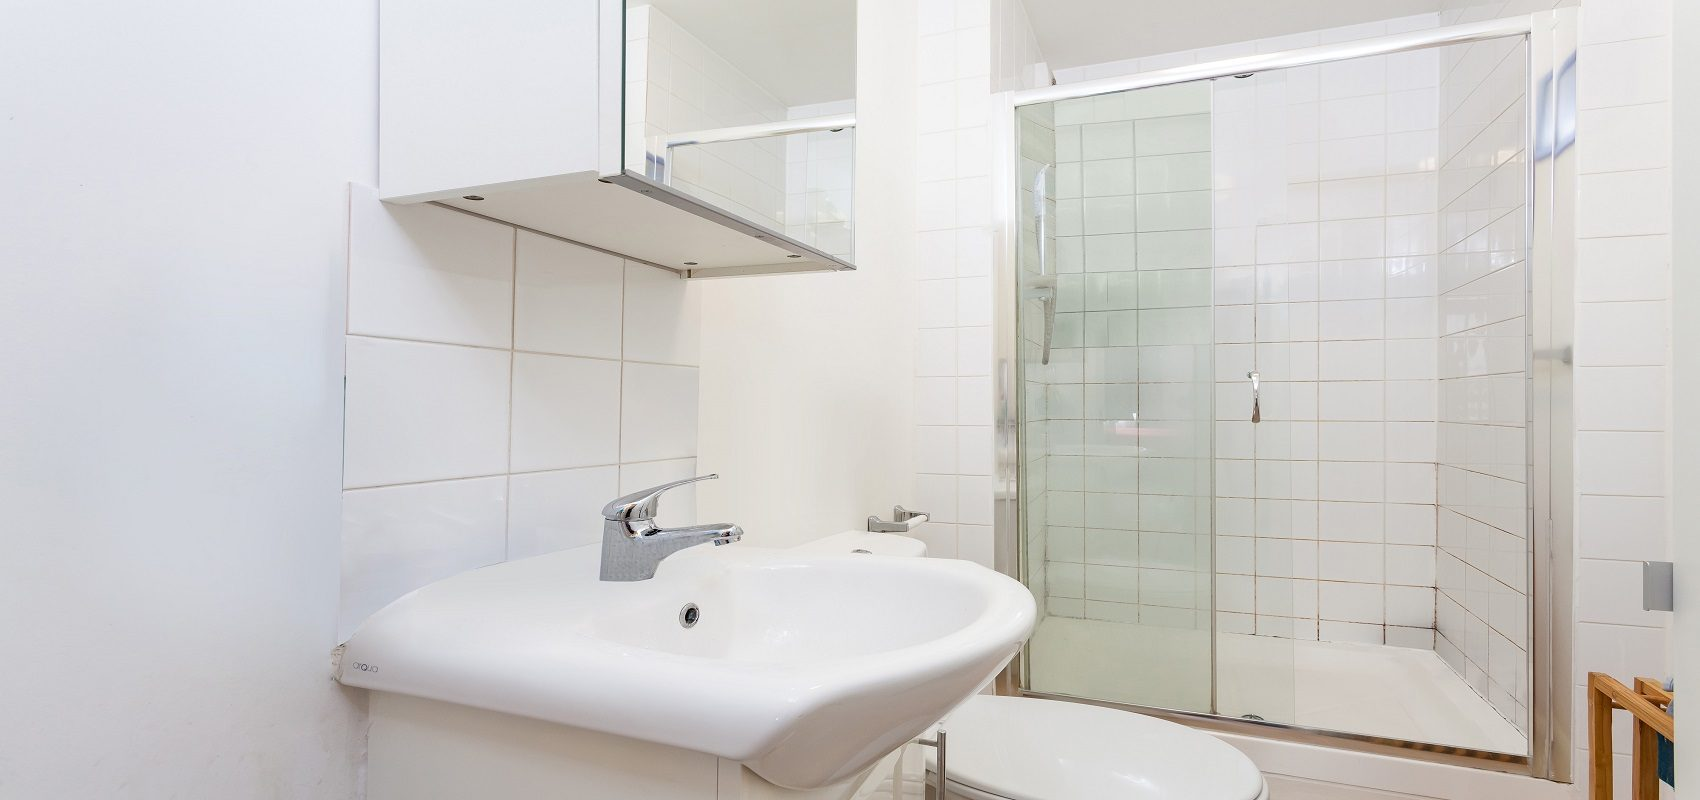 MODERN 1 BEDROOM FLAT – FOR RENT